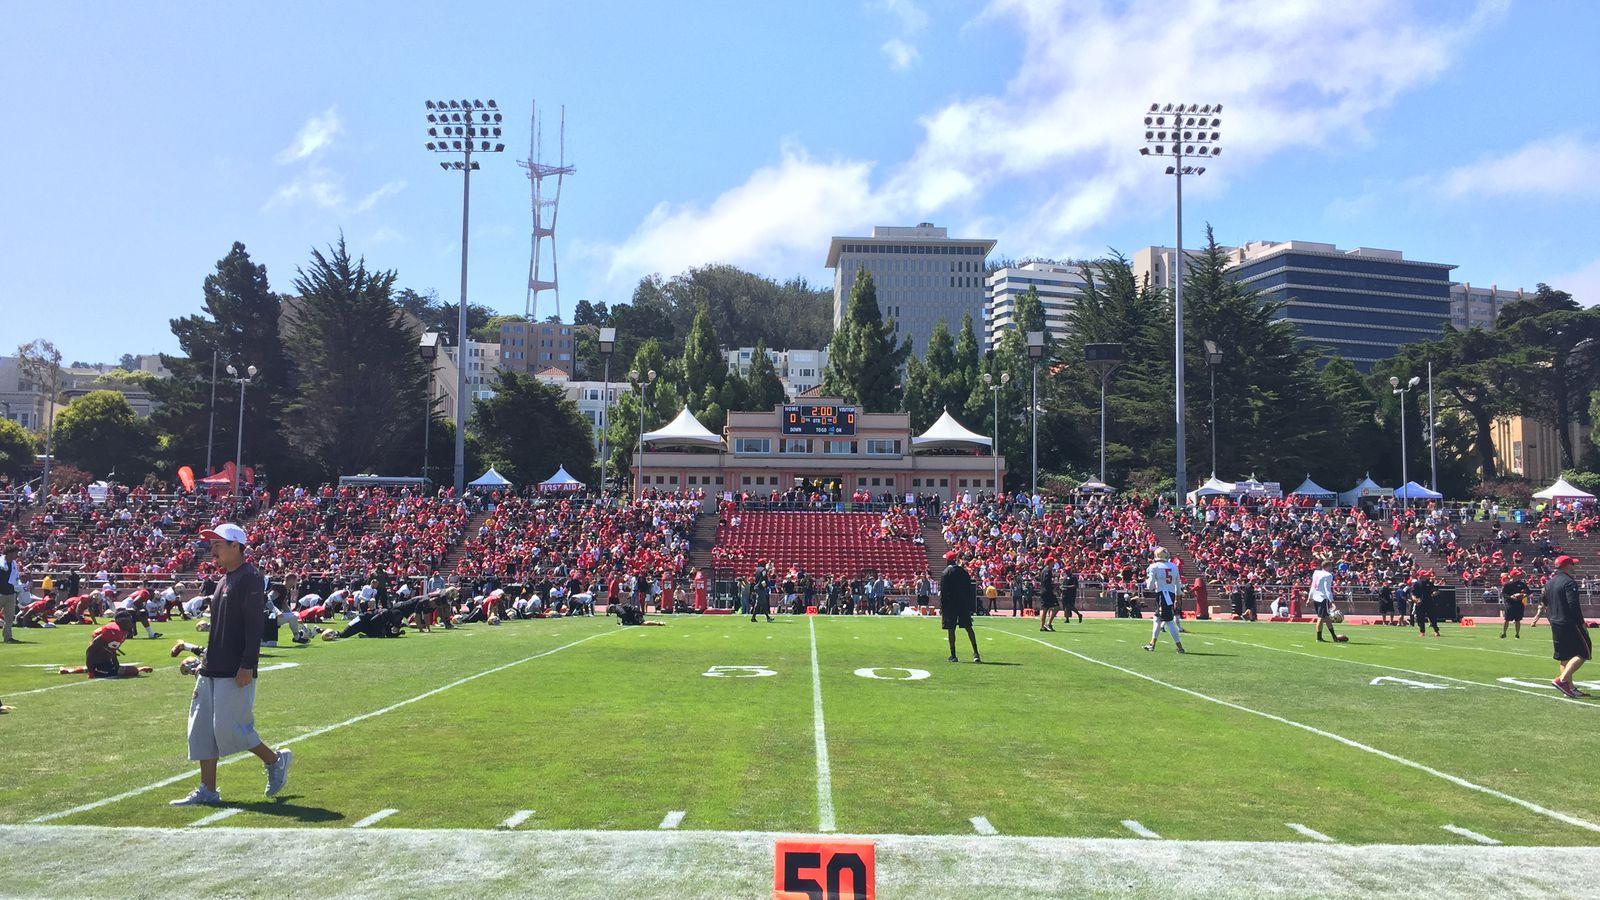 kezar stadium practice recap  49ers first and only open